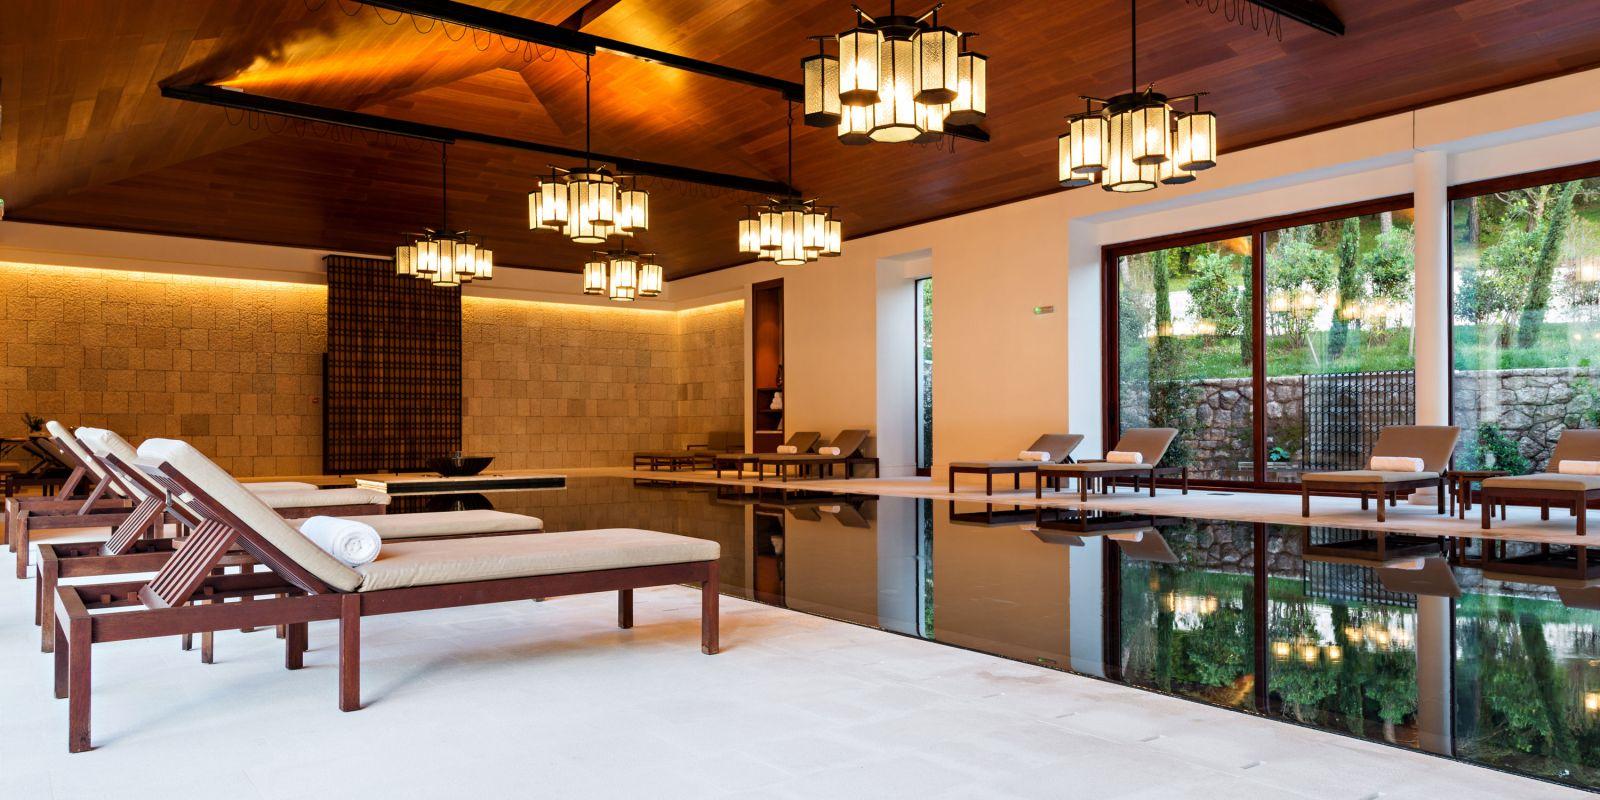 poolheizung poolsanierung swimmingpool pool bauen ac schwimmbadtechnik. Black Bedroom Furniture Sets. Home Design Ideas